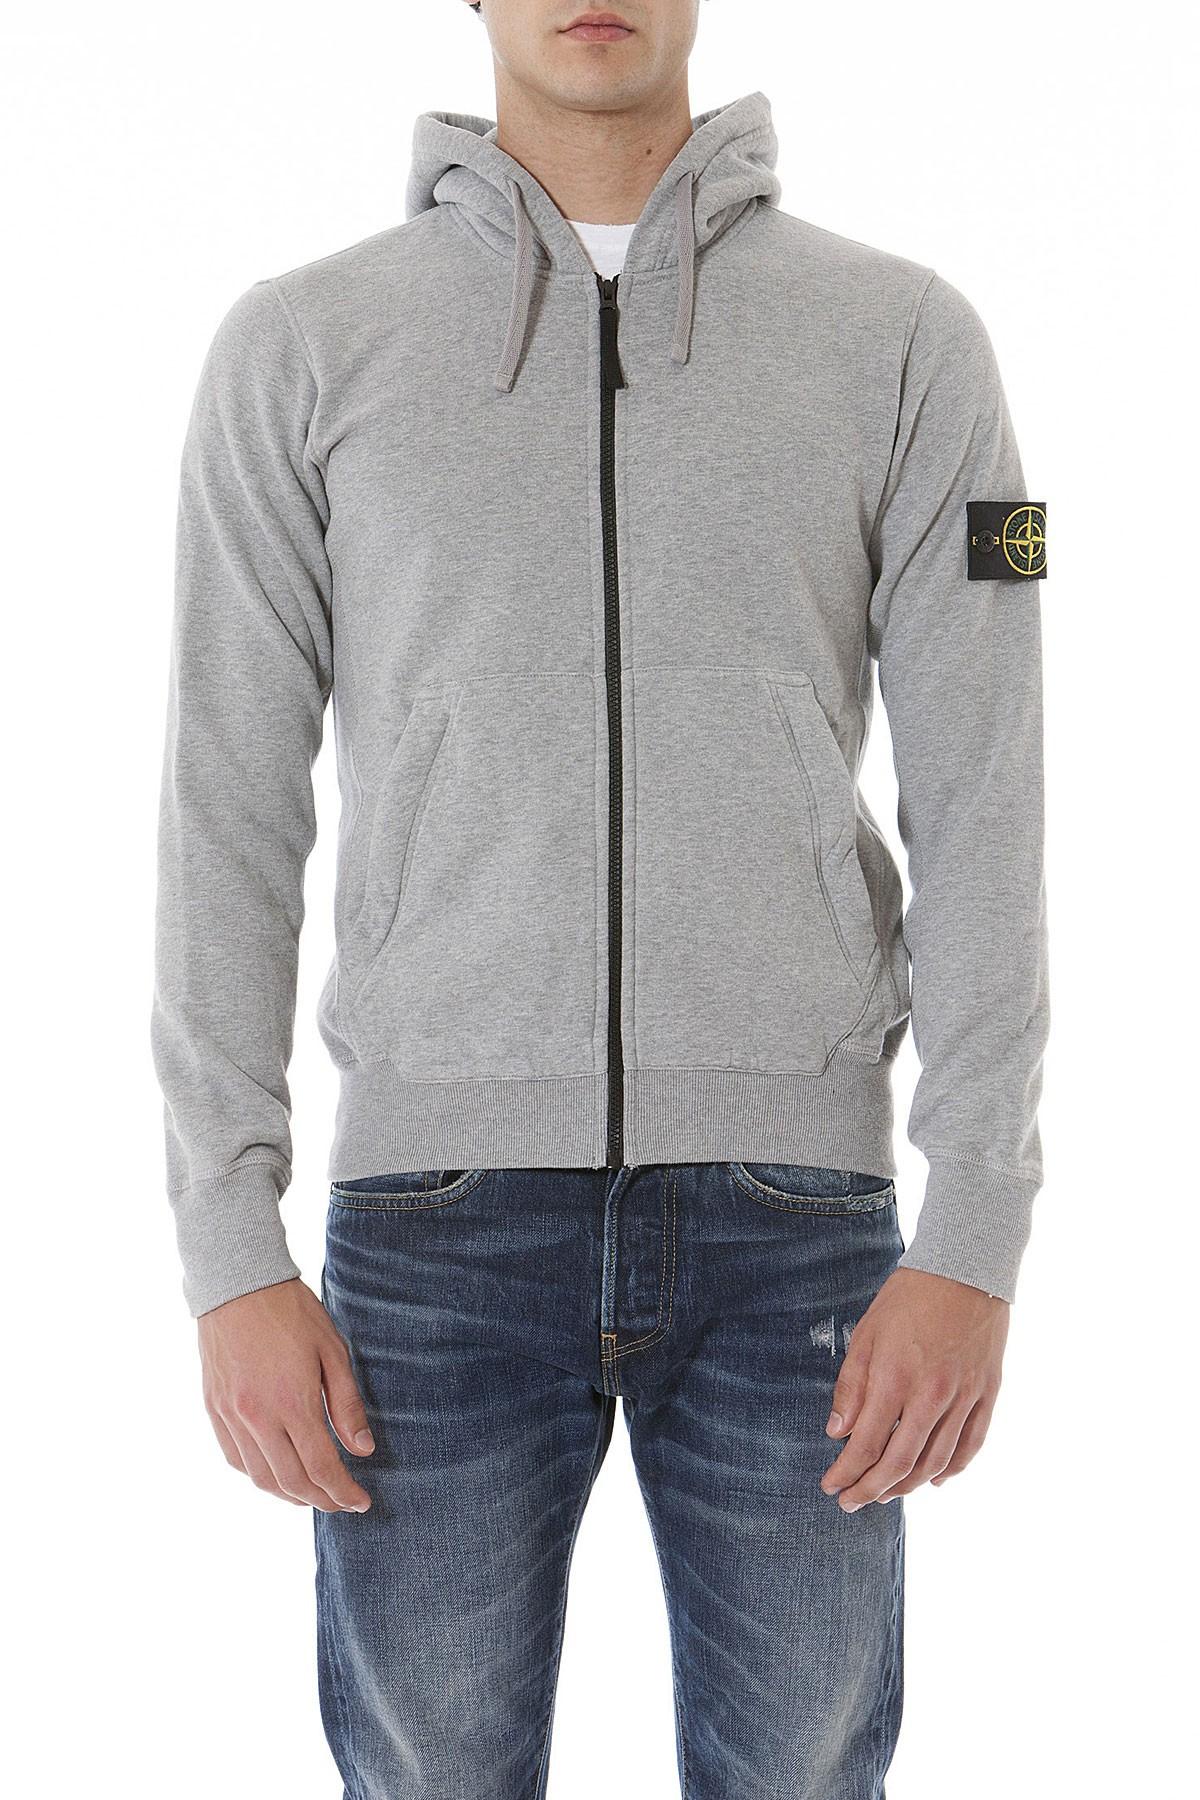 5ad5bfcbed70 STONE ISLAND Gray sweatshirt for men autumn winter 14-15 - Rione Fontana